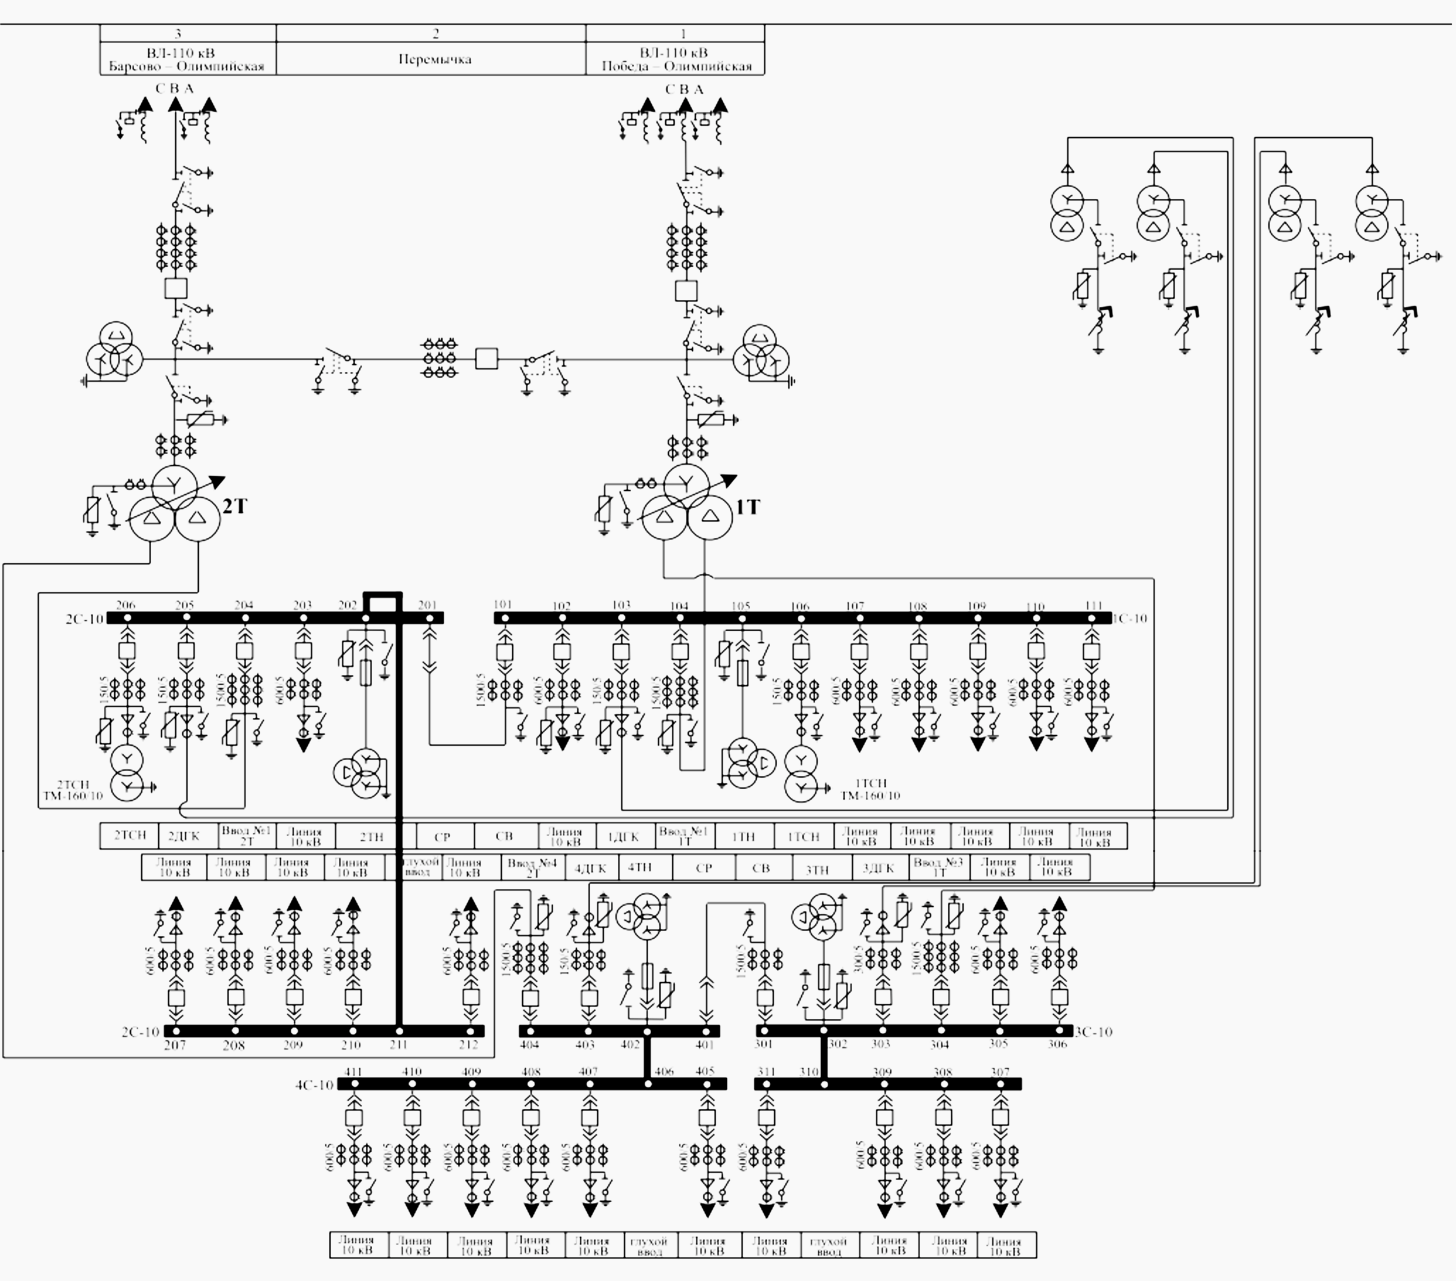 single line diagram of power distribution car lighting system wiring 110 kv olympic substation